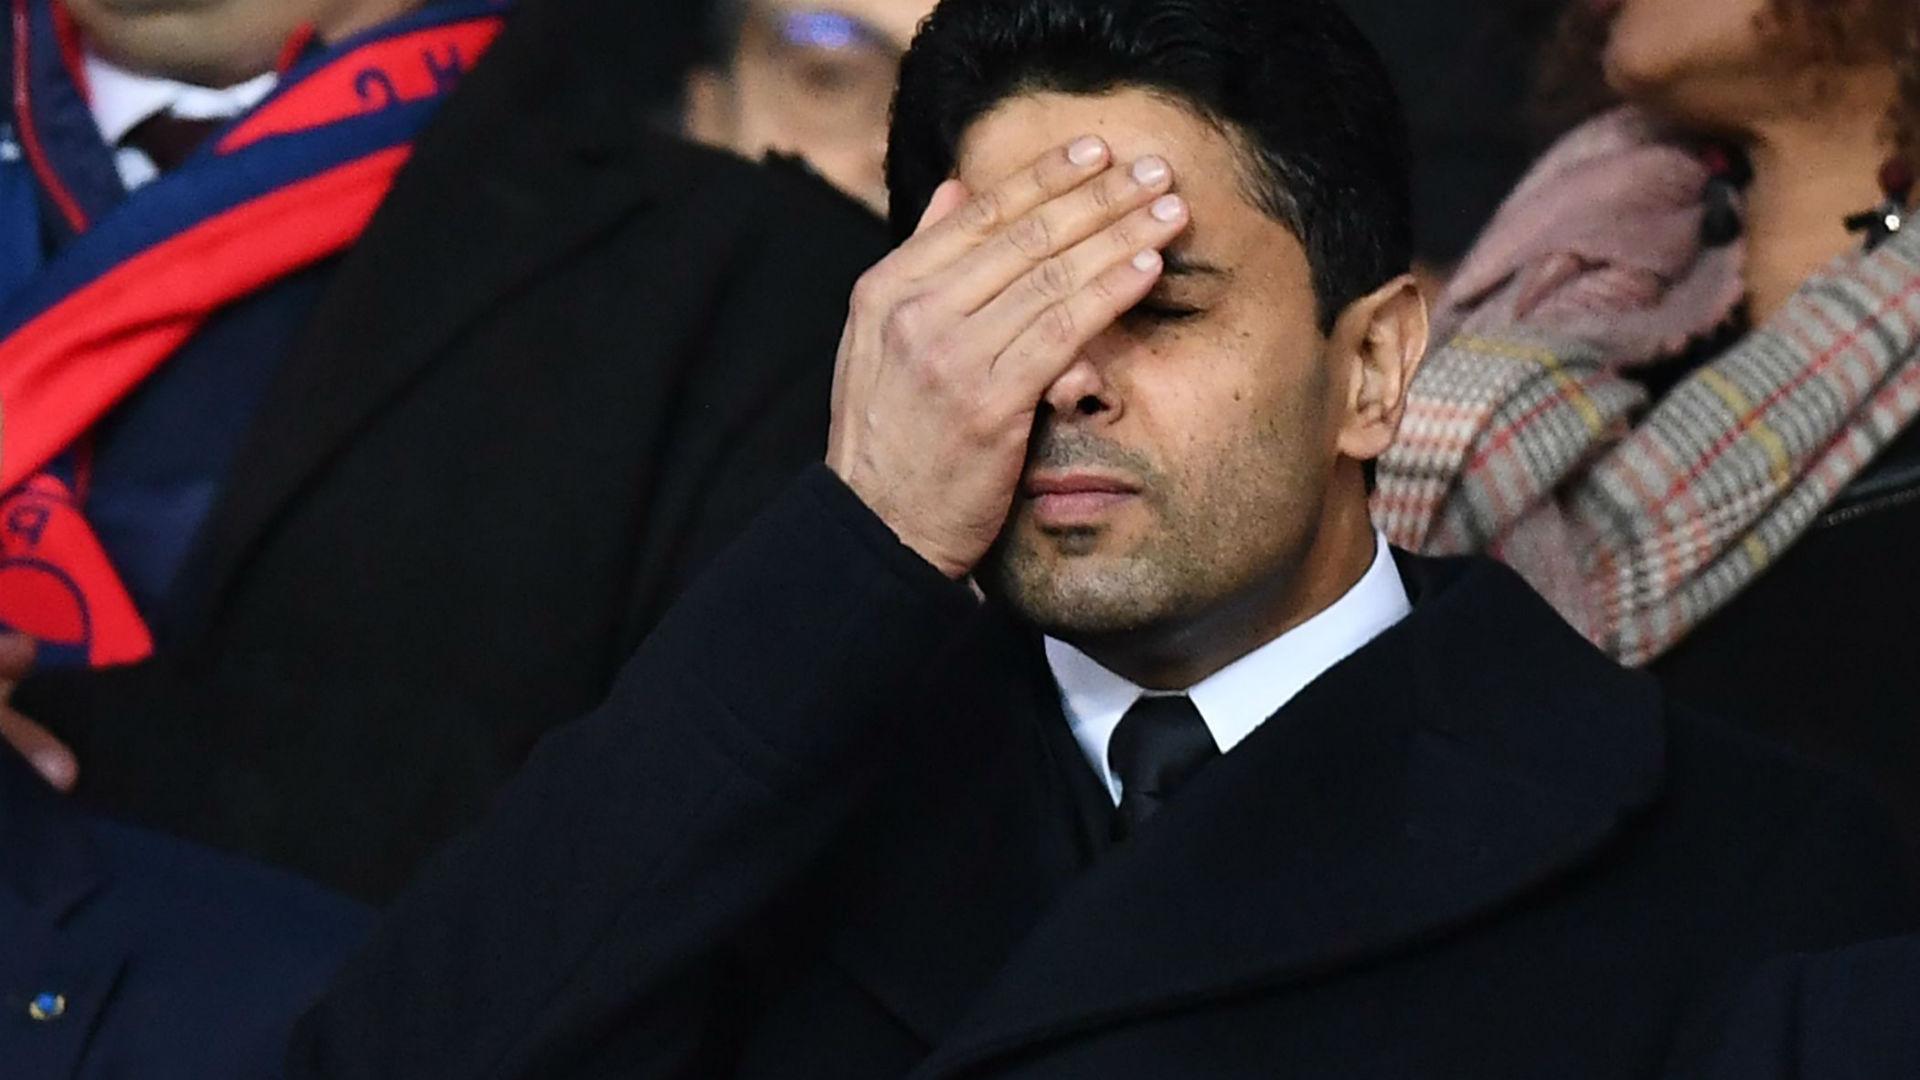 PSG president Al-Khelaifi denies corruption allegations relating to 2017 World Athletics Championship bid